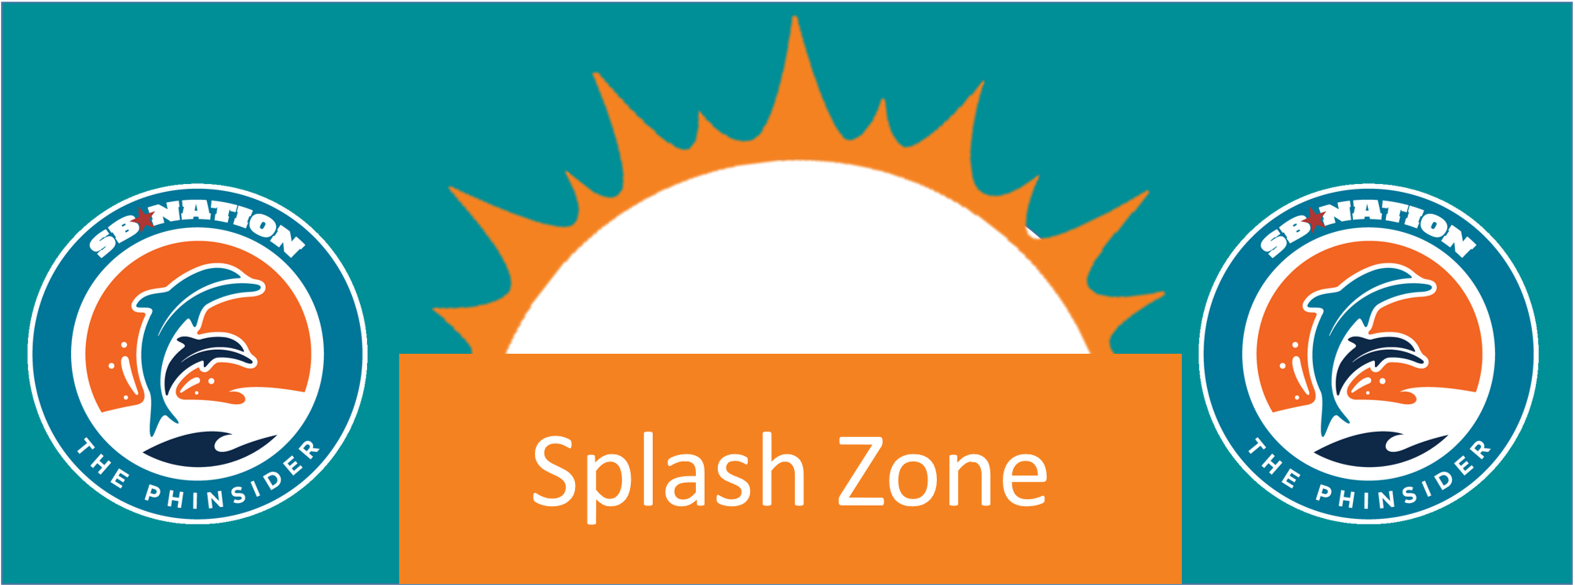 splash_zone.0.png